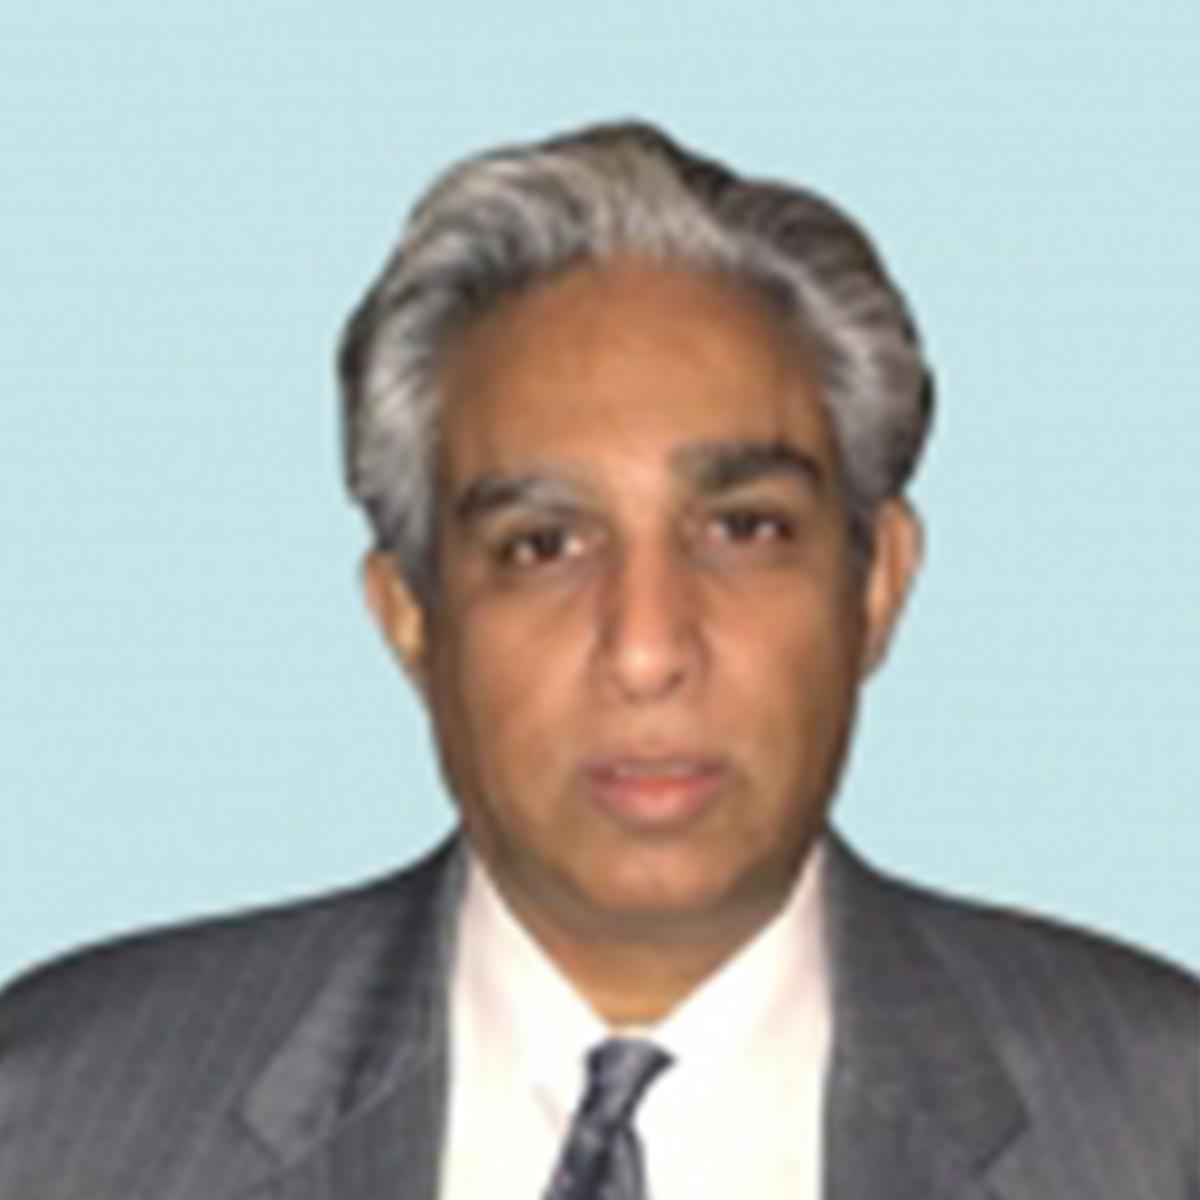 Vivek-Sehgal-md-abr-radiologist-130x130.jpg